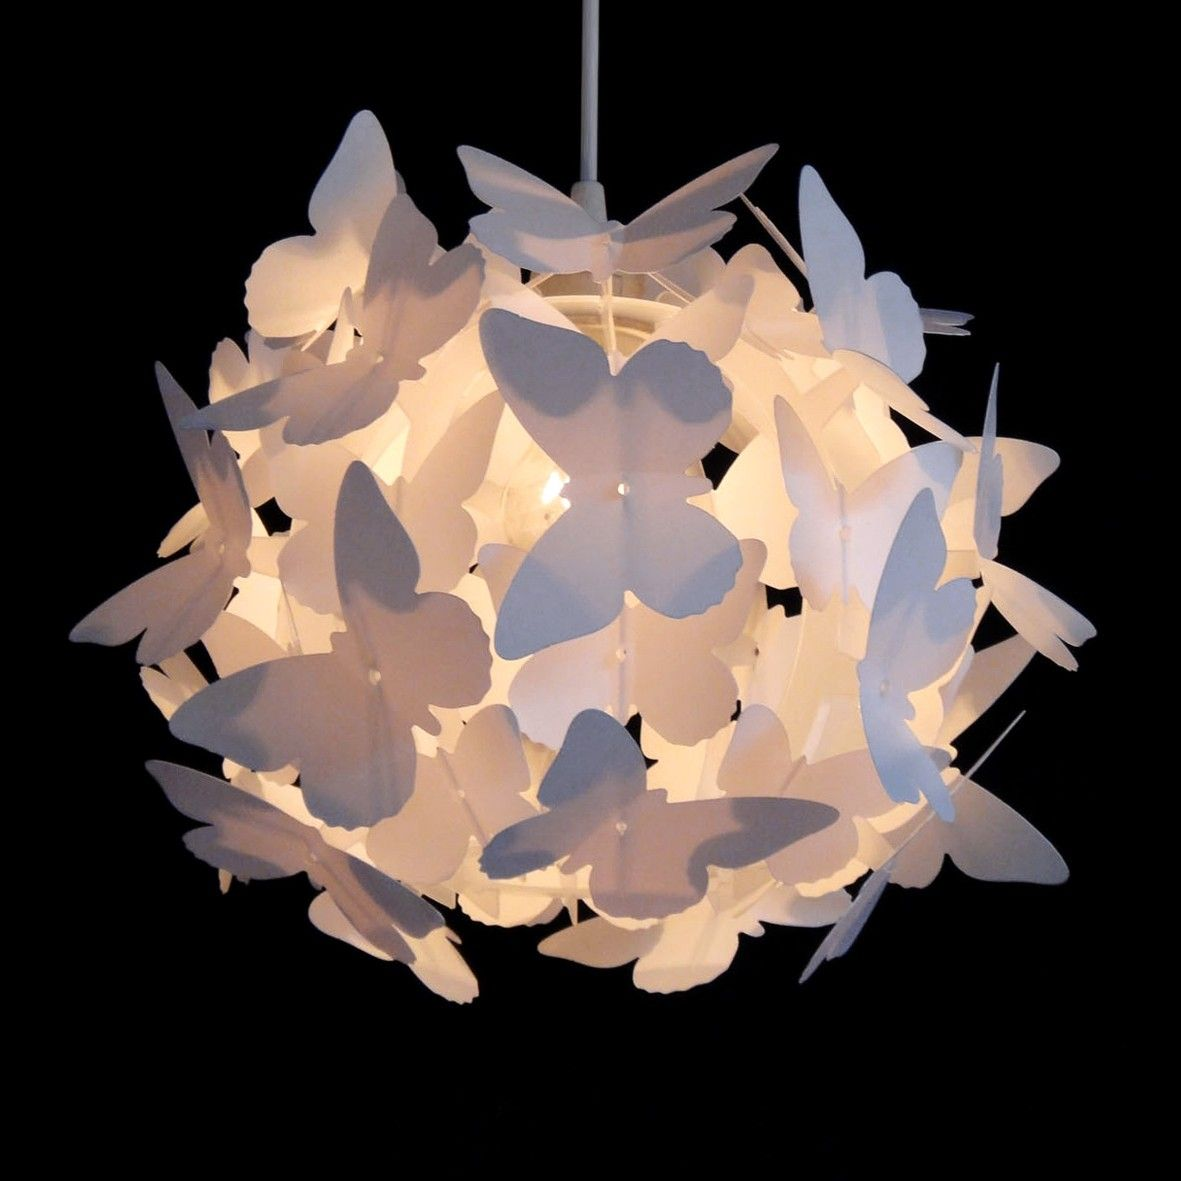 Girls chandelier shades interesting chandeliers pinterest bedrooms aloadofball Images